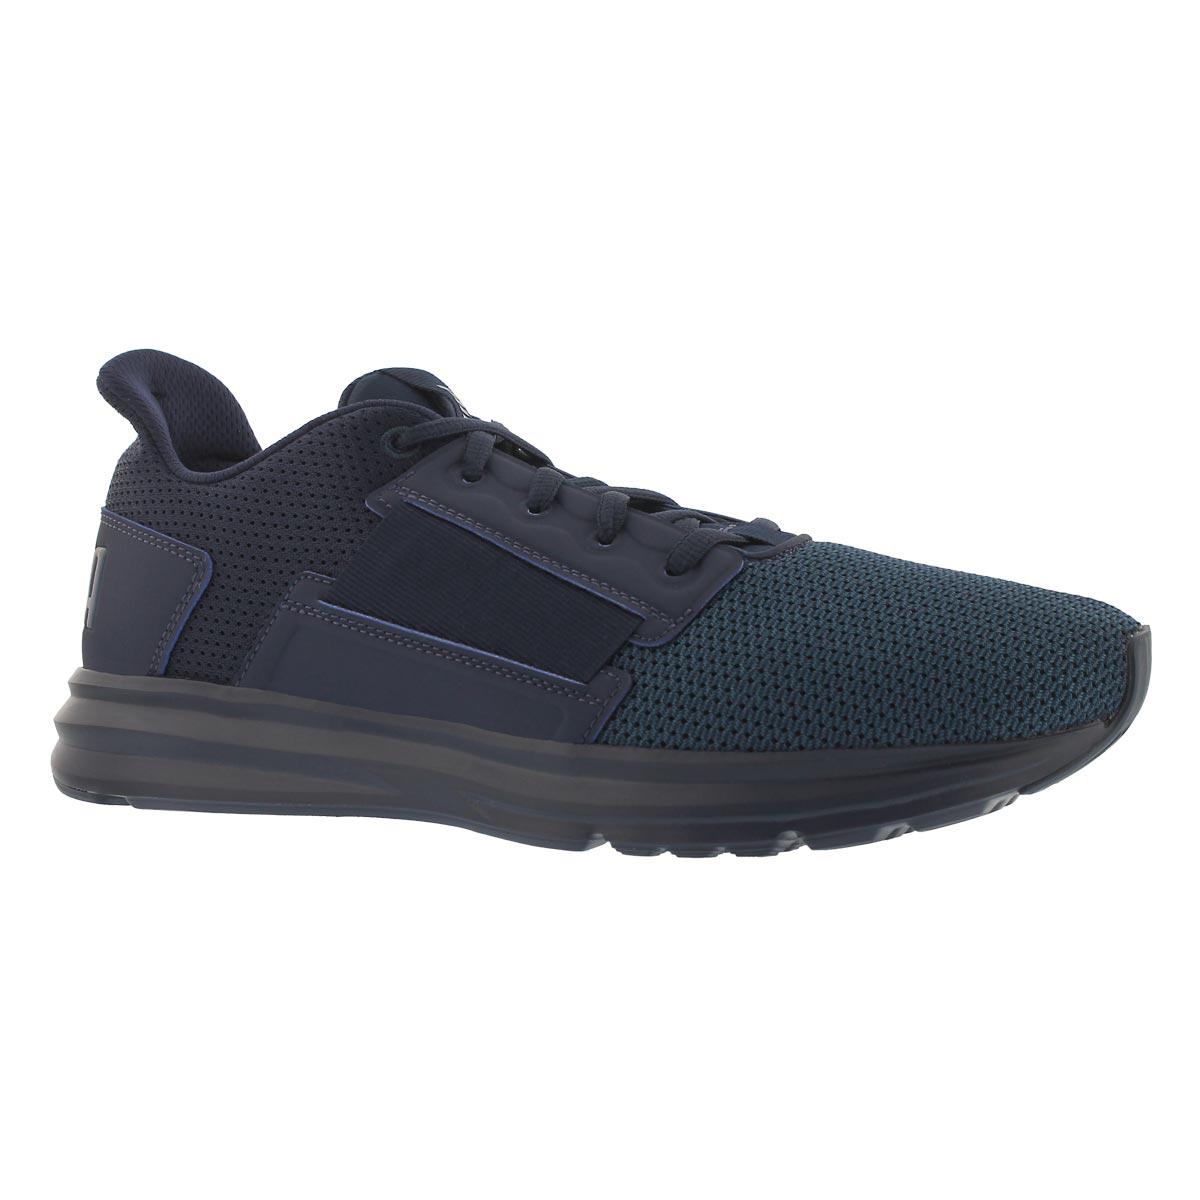 Men's ENZO STREET peacoat blue sneakers